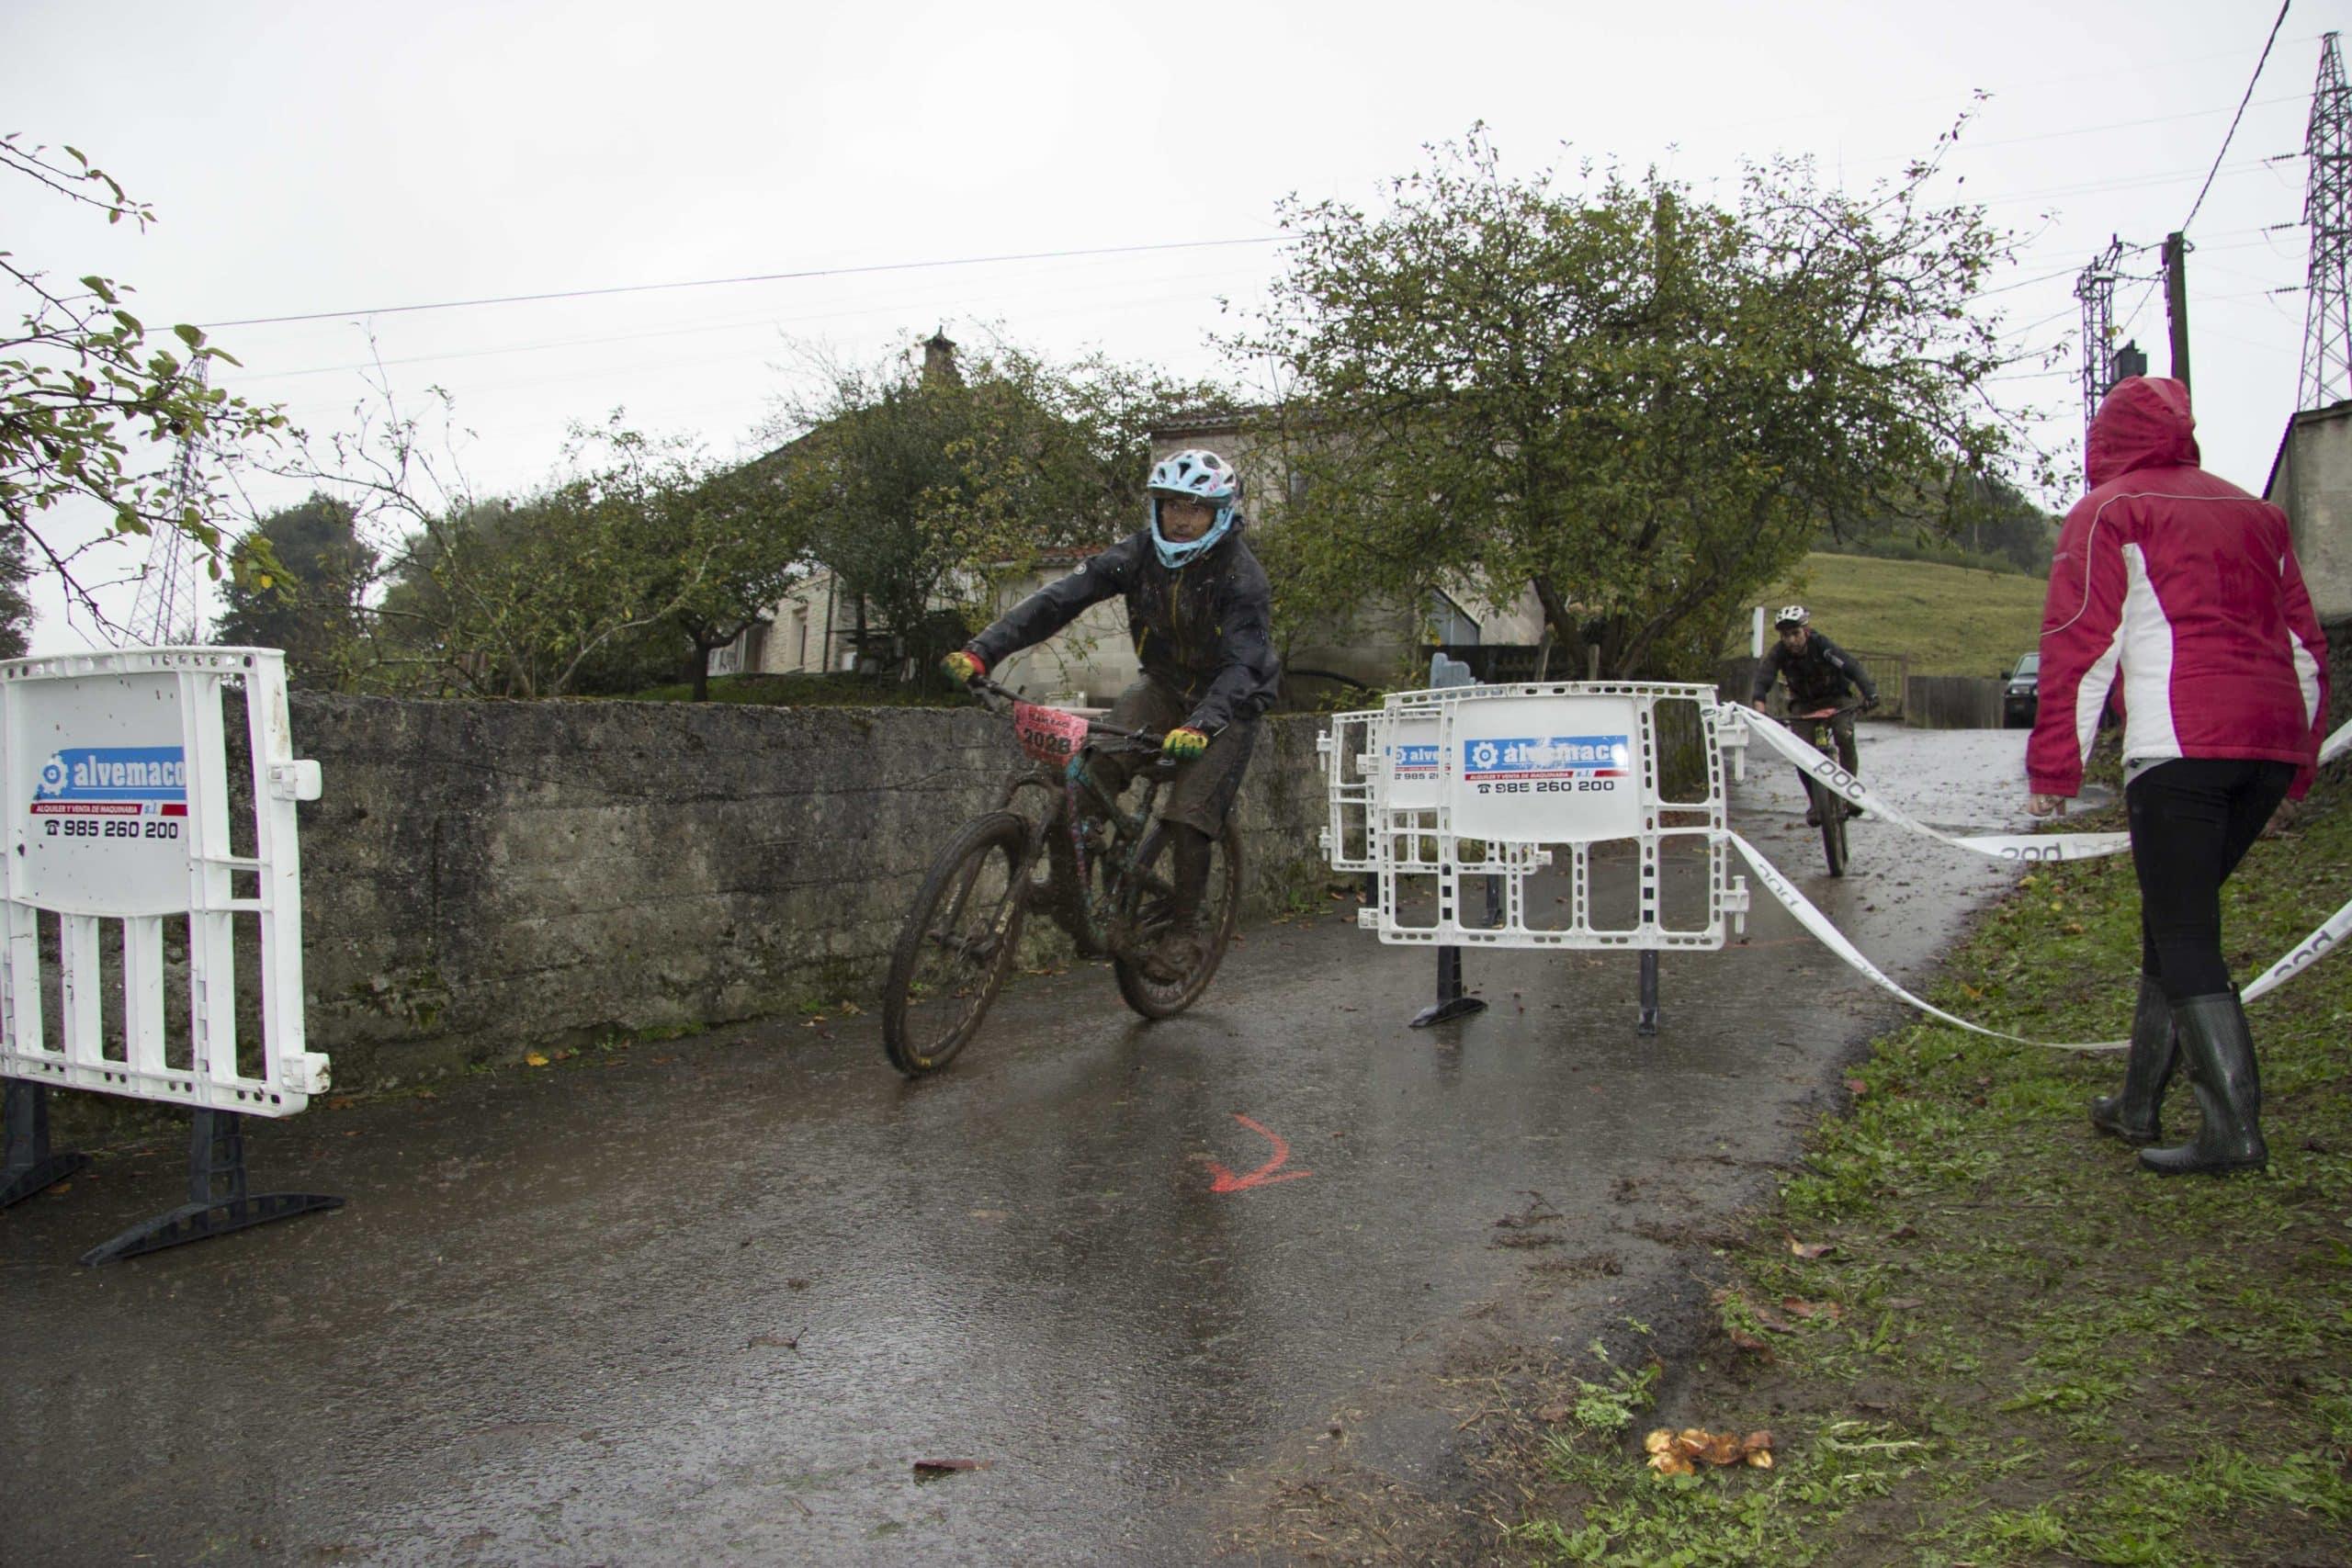 bicicletas-david-vencedores-en-enduro-2-afrontan-la-chicanne-de-meta-del-tc4